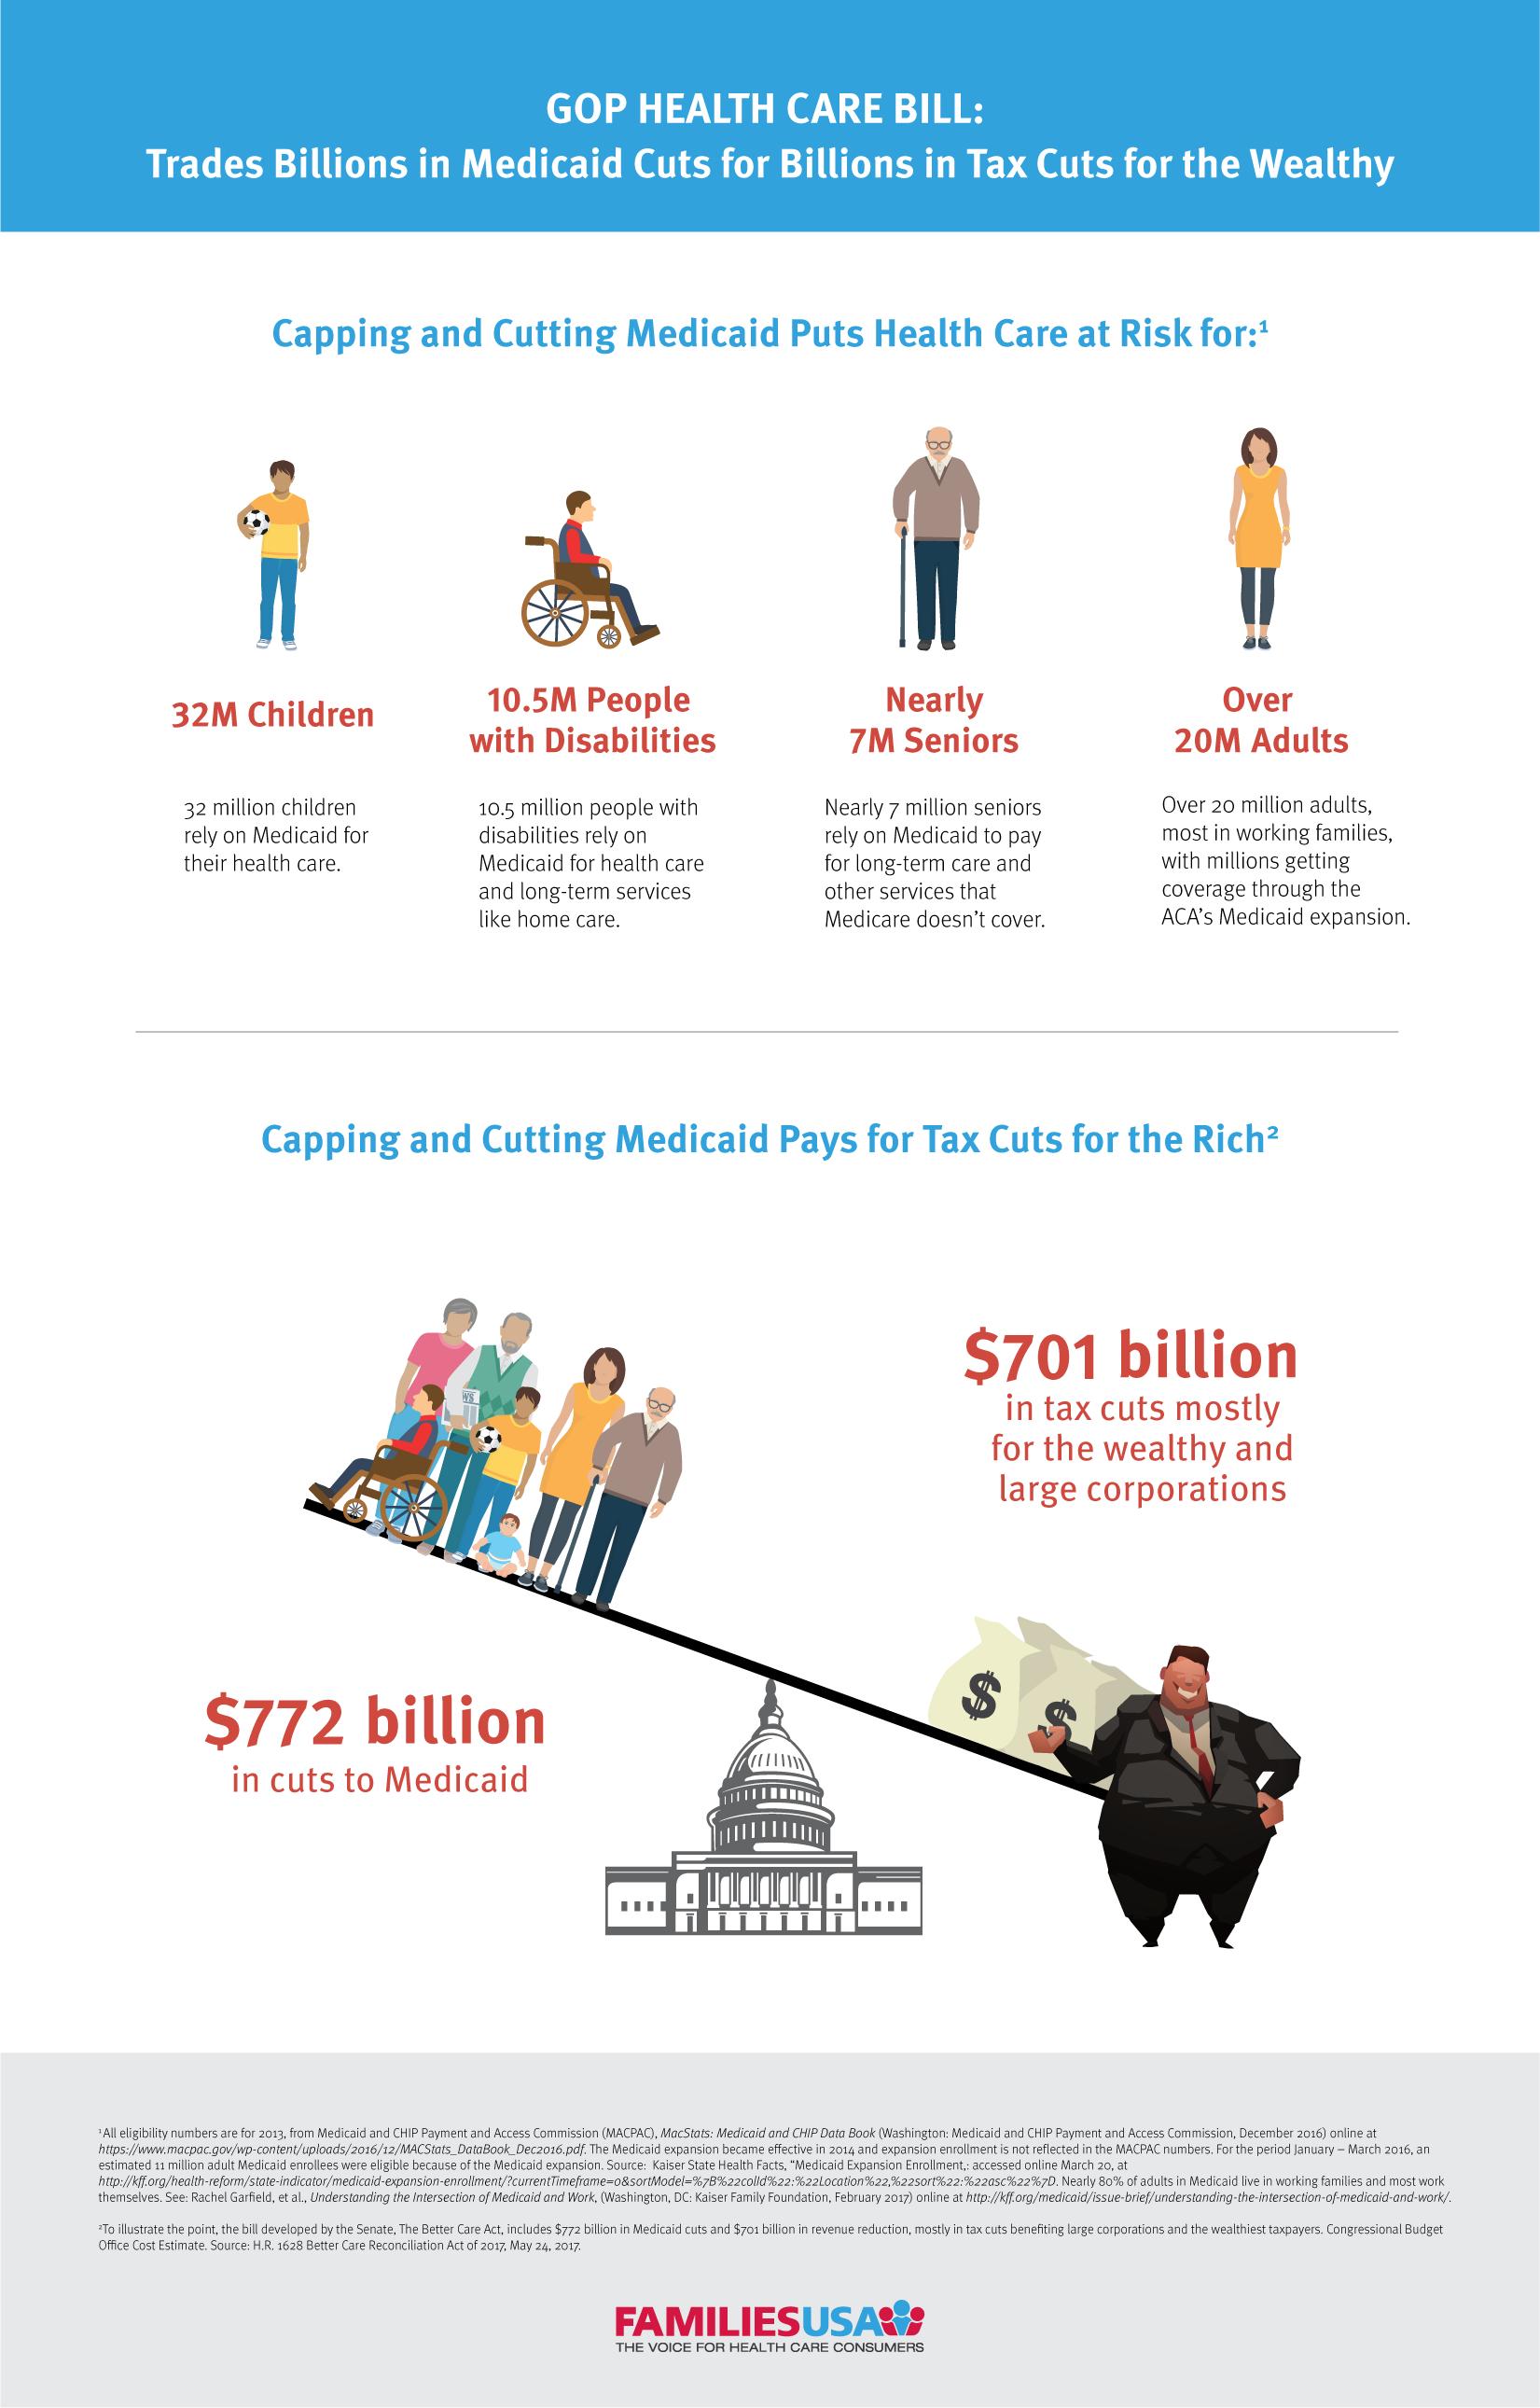 https://familiesusa.org/wp-content/uploads/2019/09/Medicaid_TaxCuts_final_062617_Artboard-1_Artboard-1.png